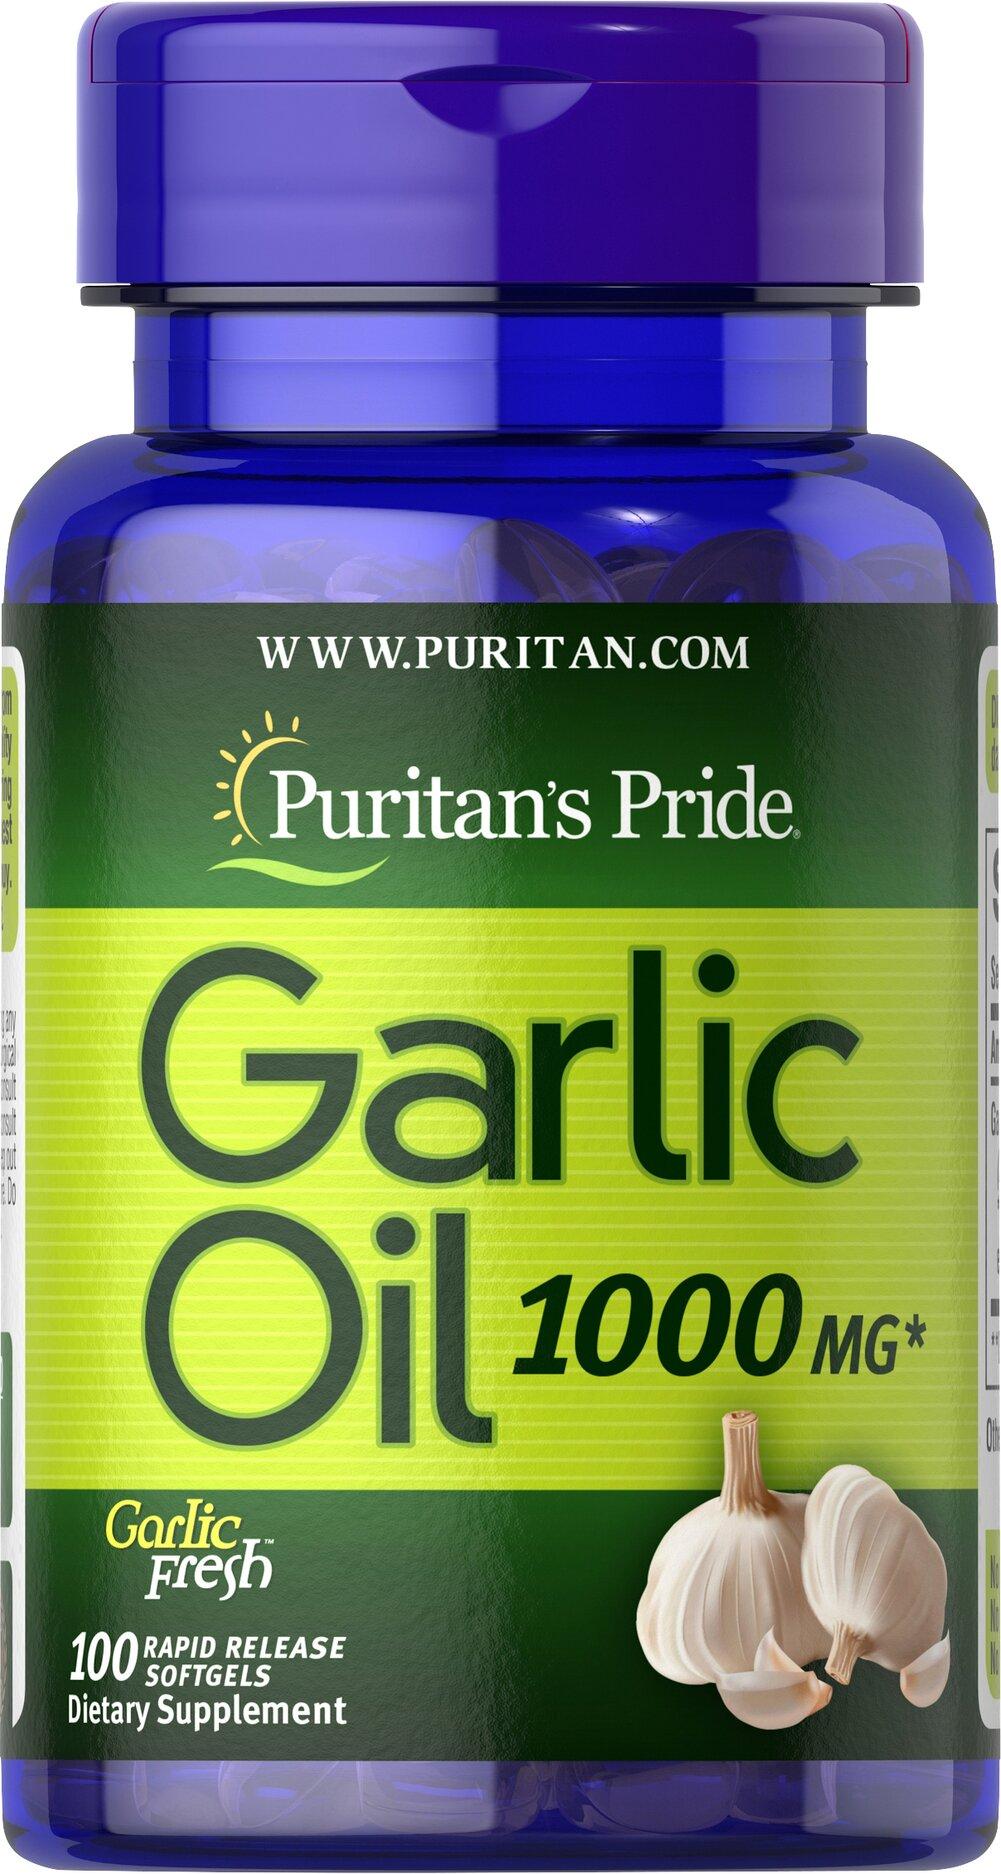 Garlic Oil 1000 mg 100 Rapid Release Softgels | Food ...